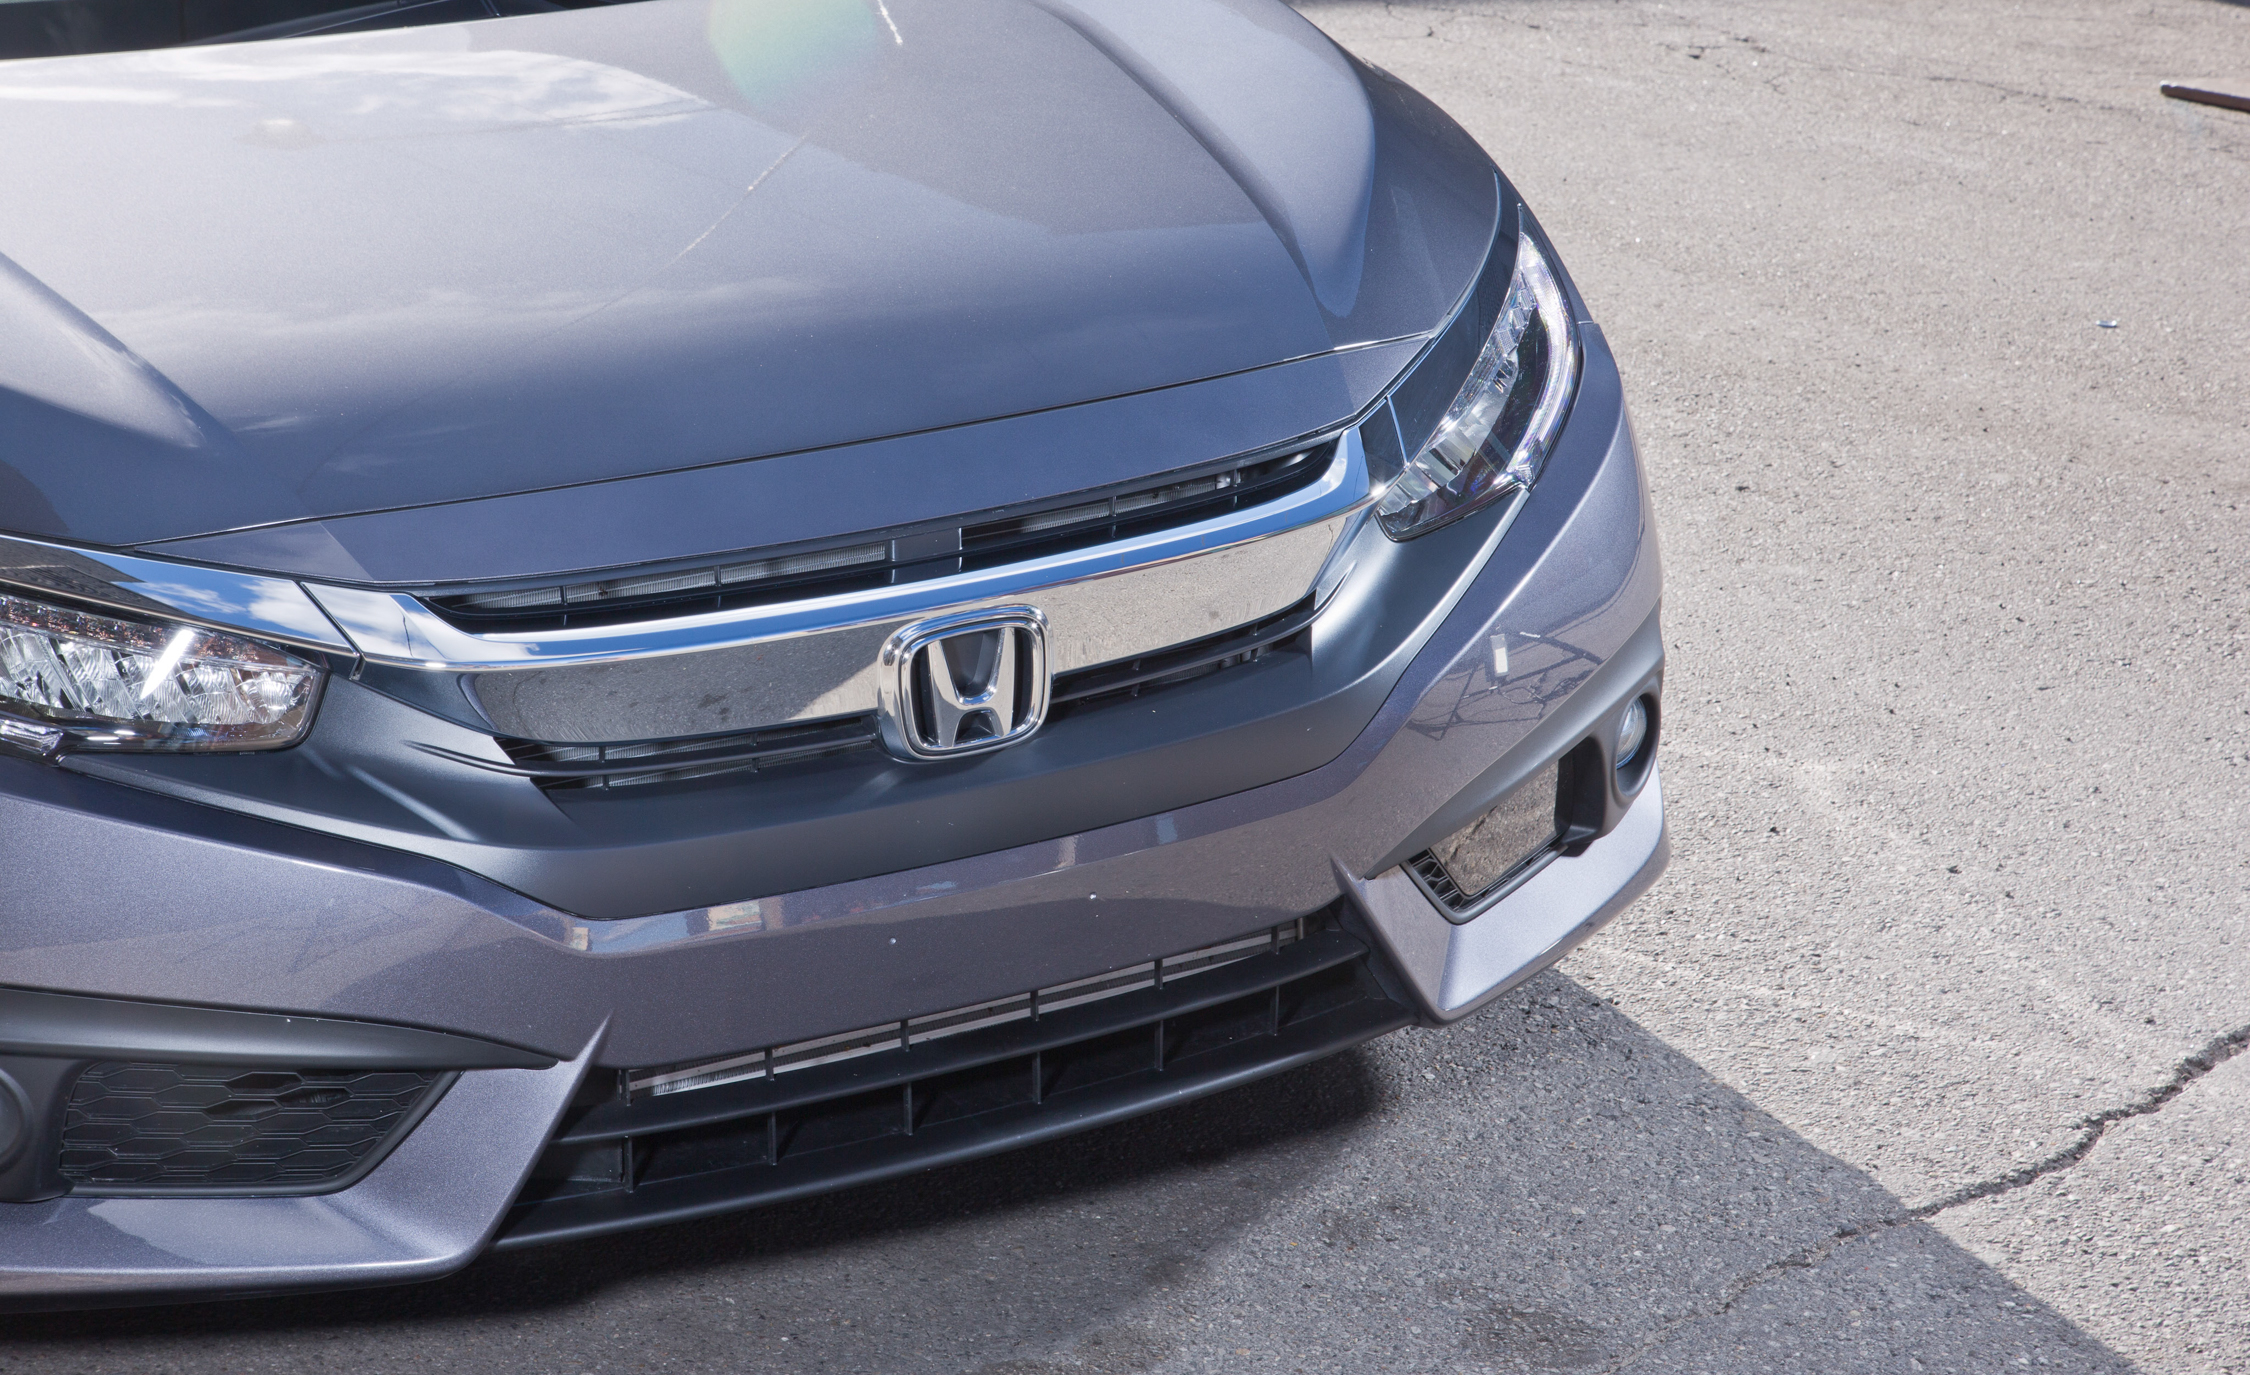 2016 Honda Civic Touring Exterior Grille